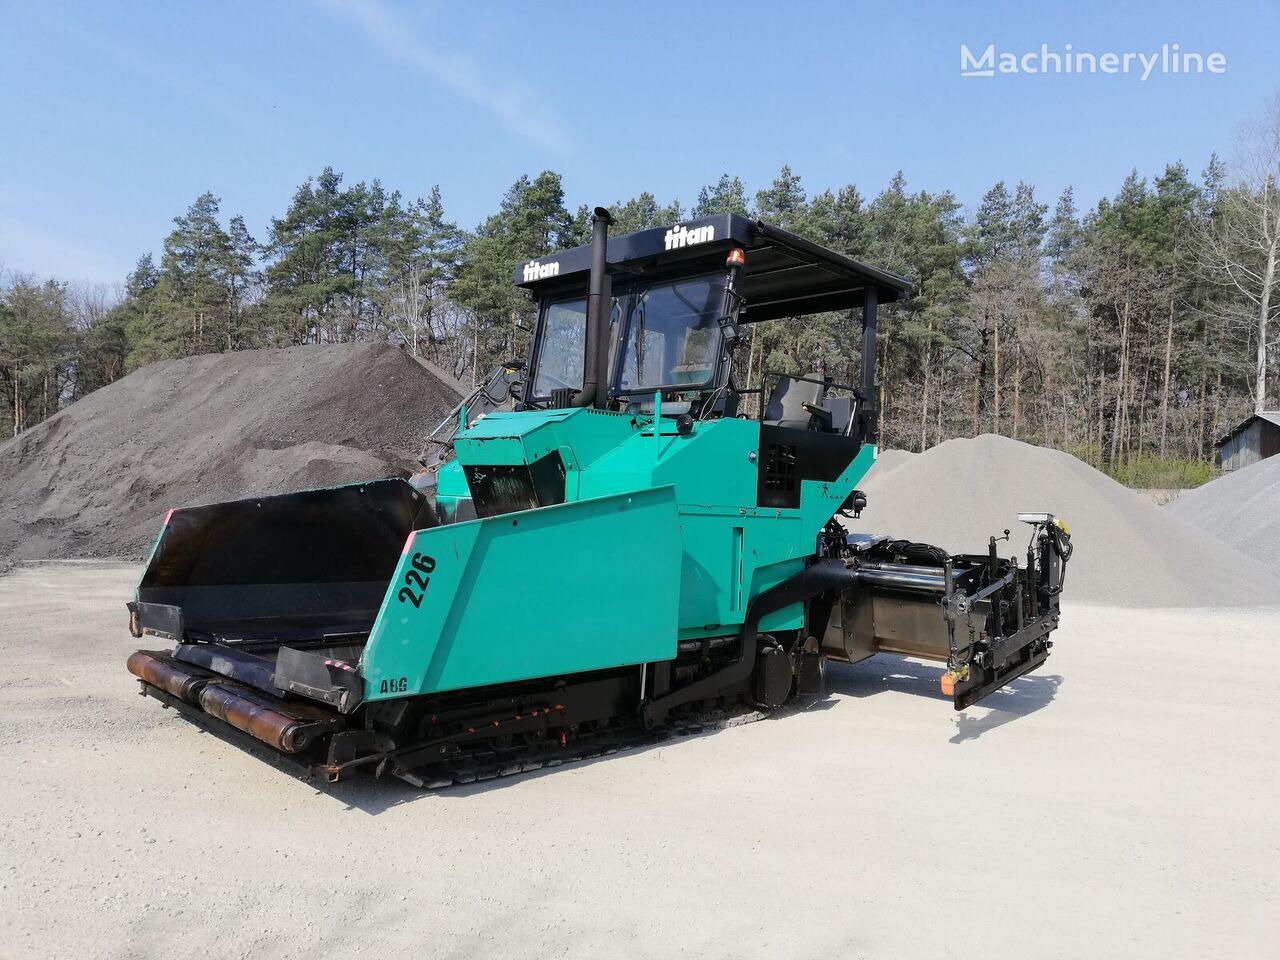 ABG Titan 226 crawler asphalt paver